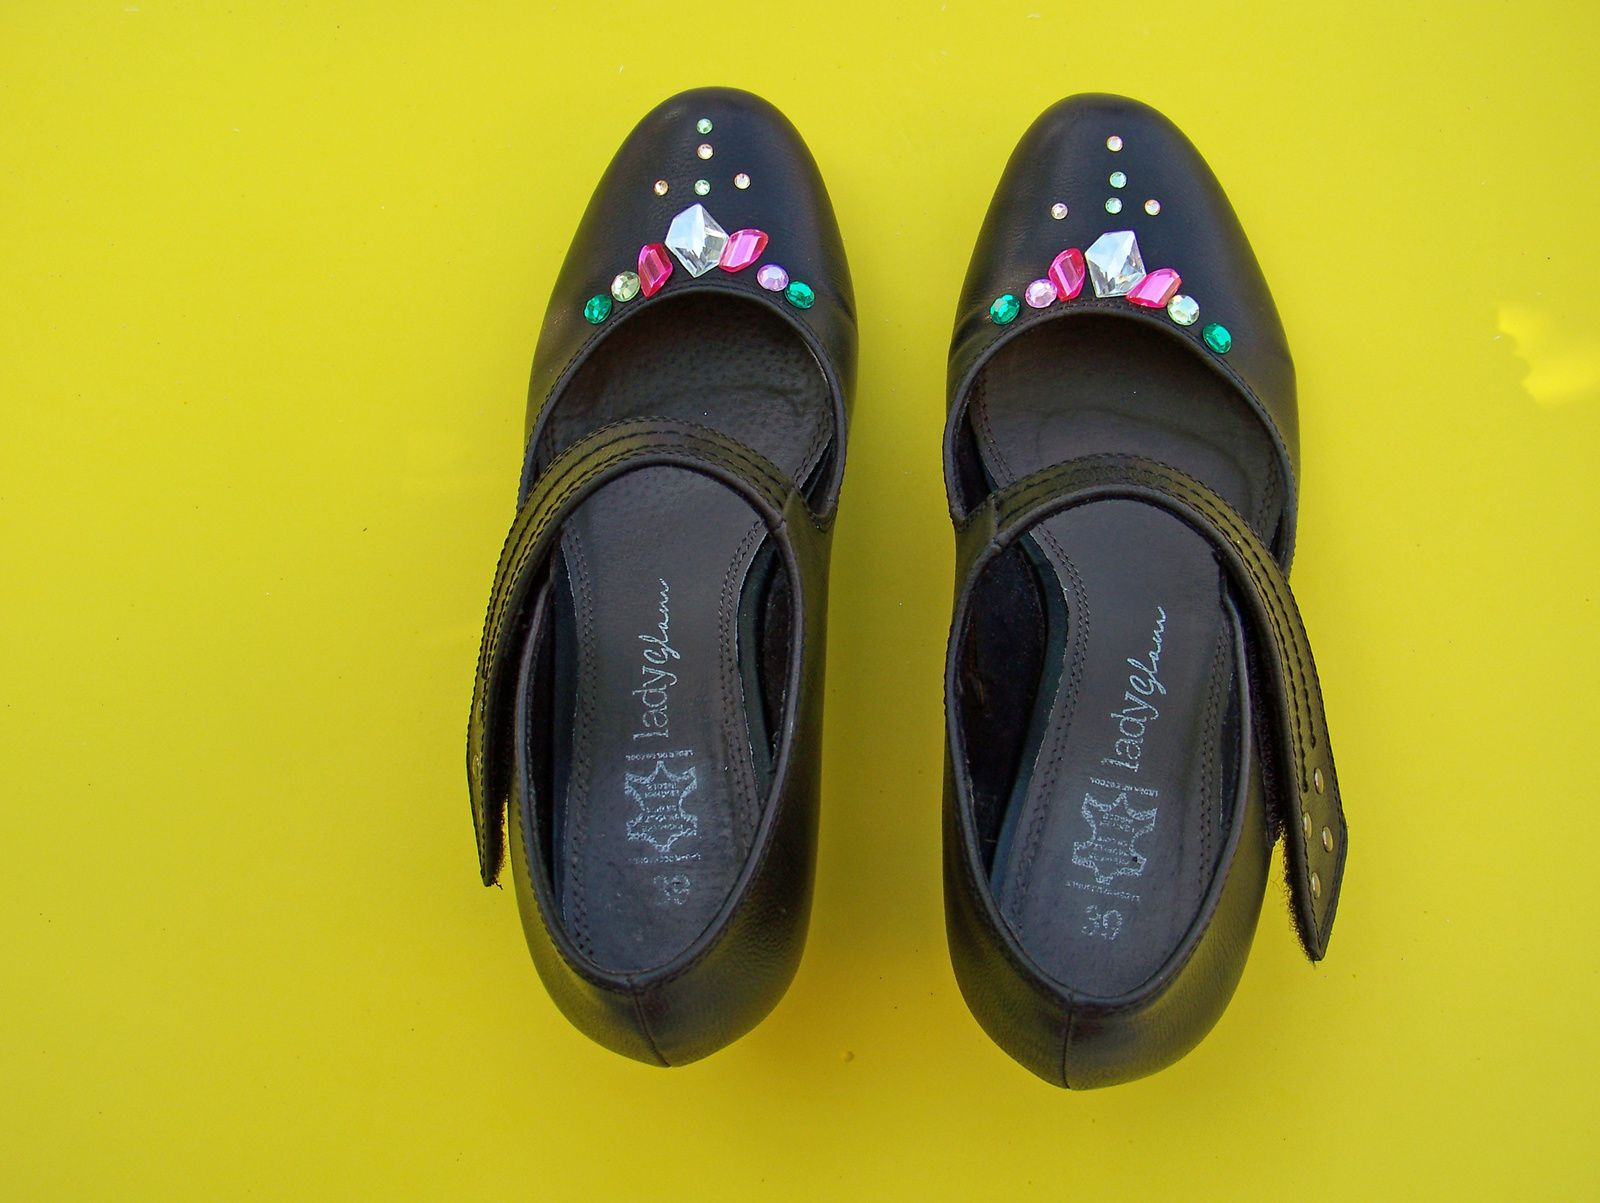 Les chaussures à strass !